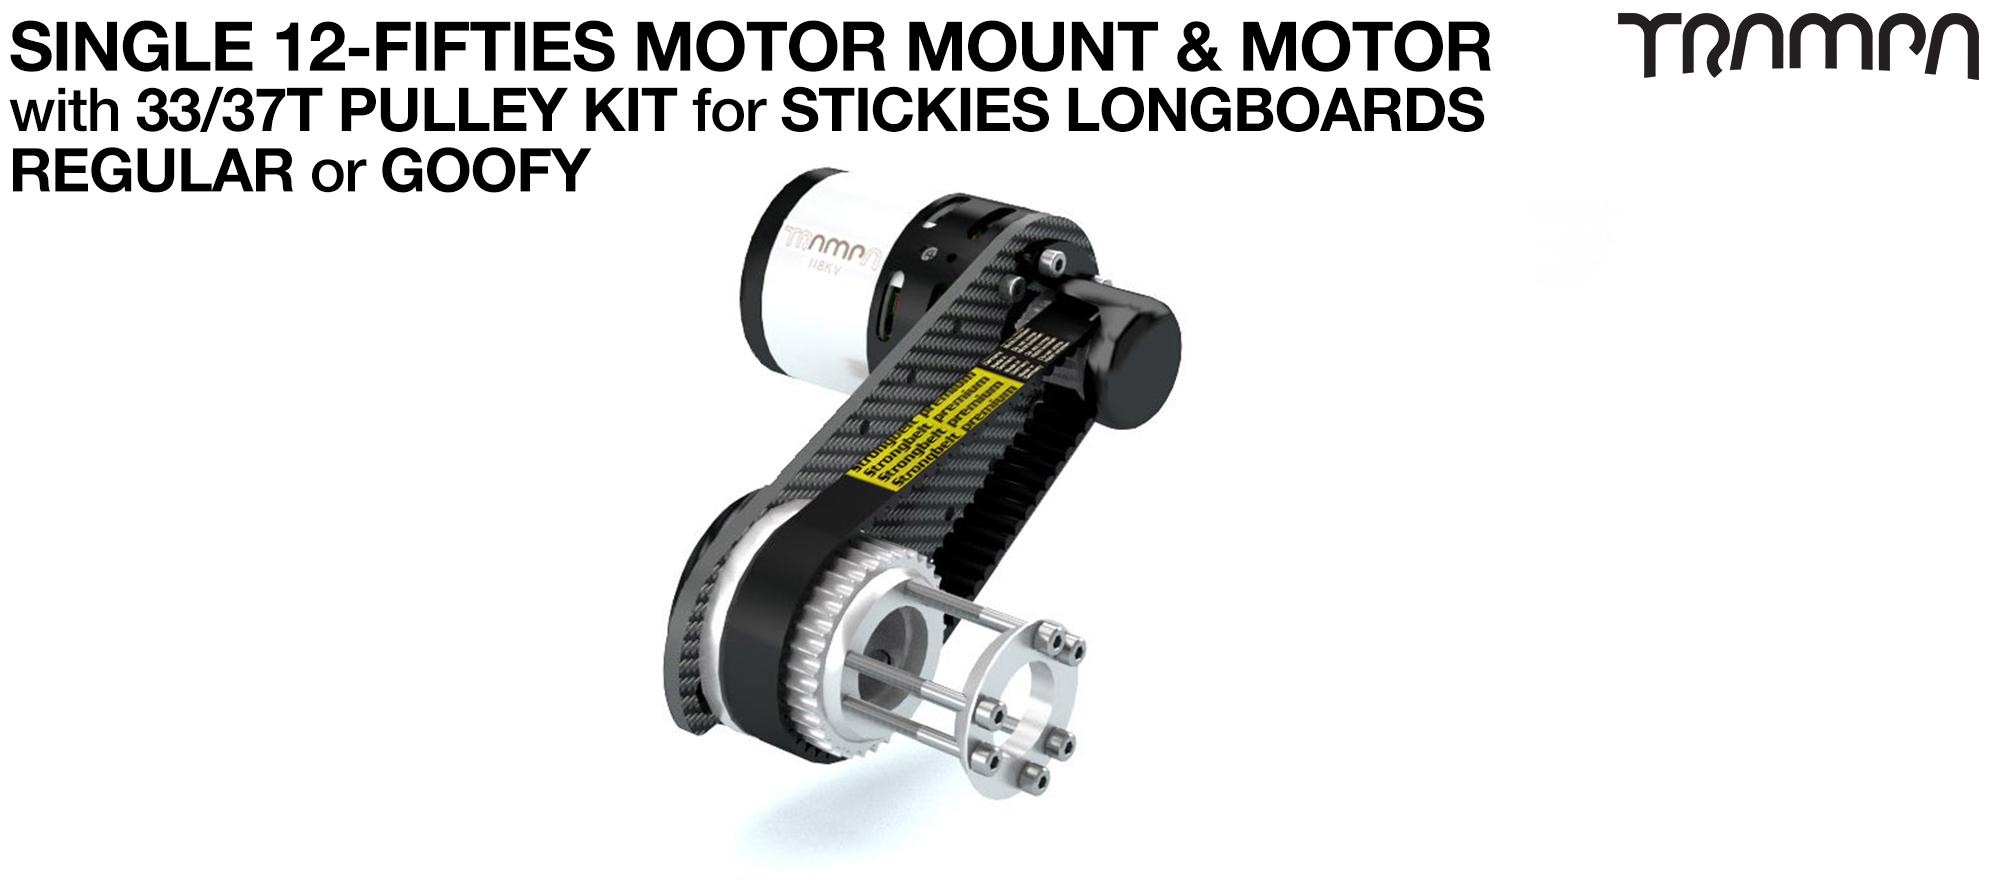 Original 12FiFties Motor Mount with Custom Motor & 33/37 Pulley Kit for STICKIES Wheels - SINGLE